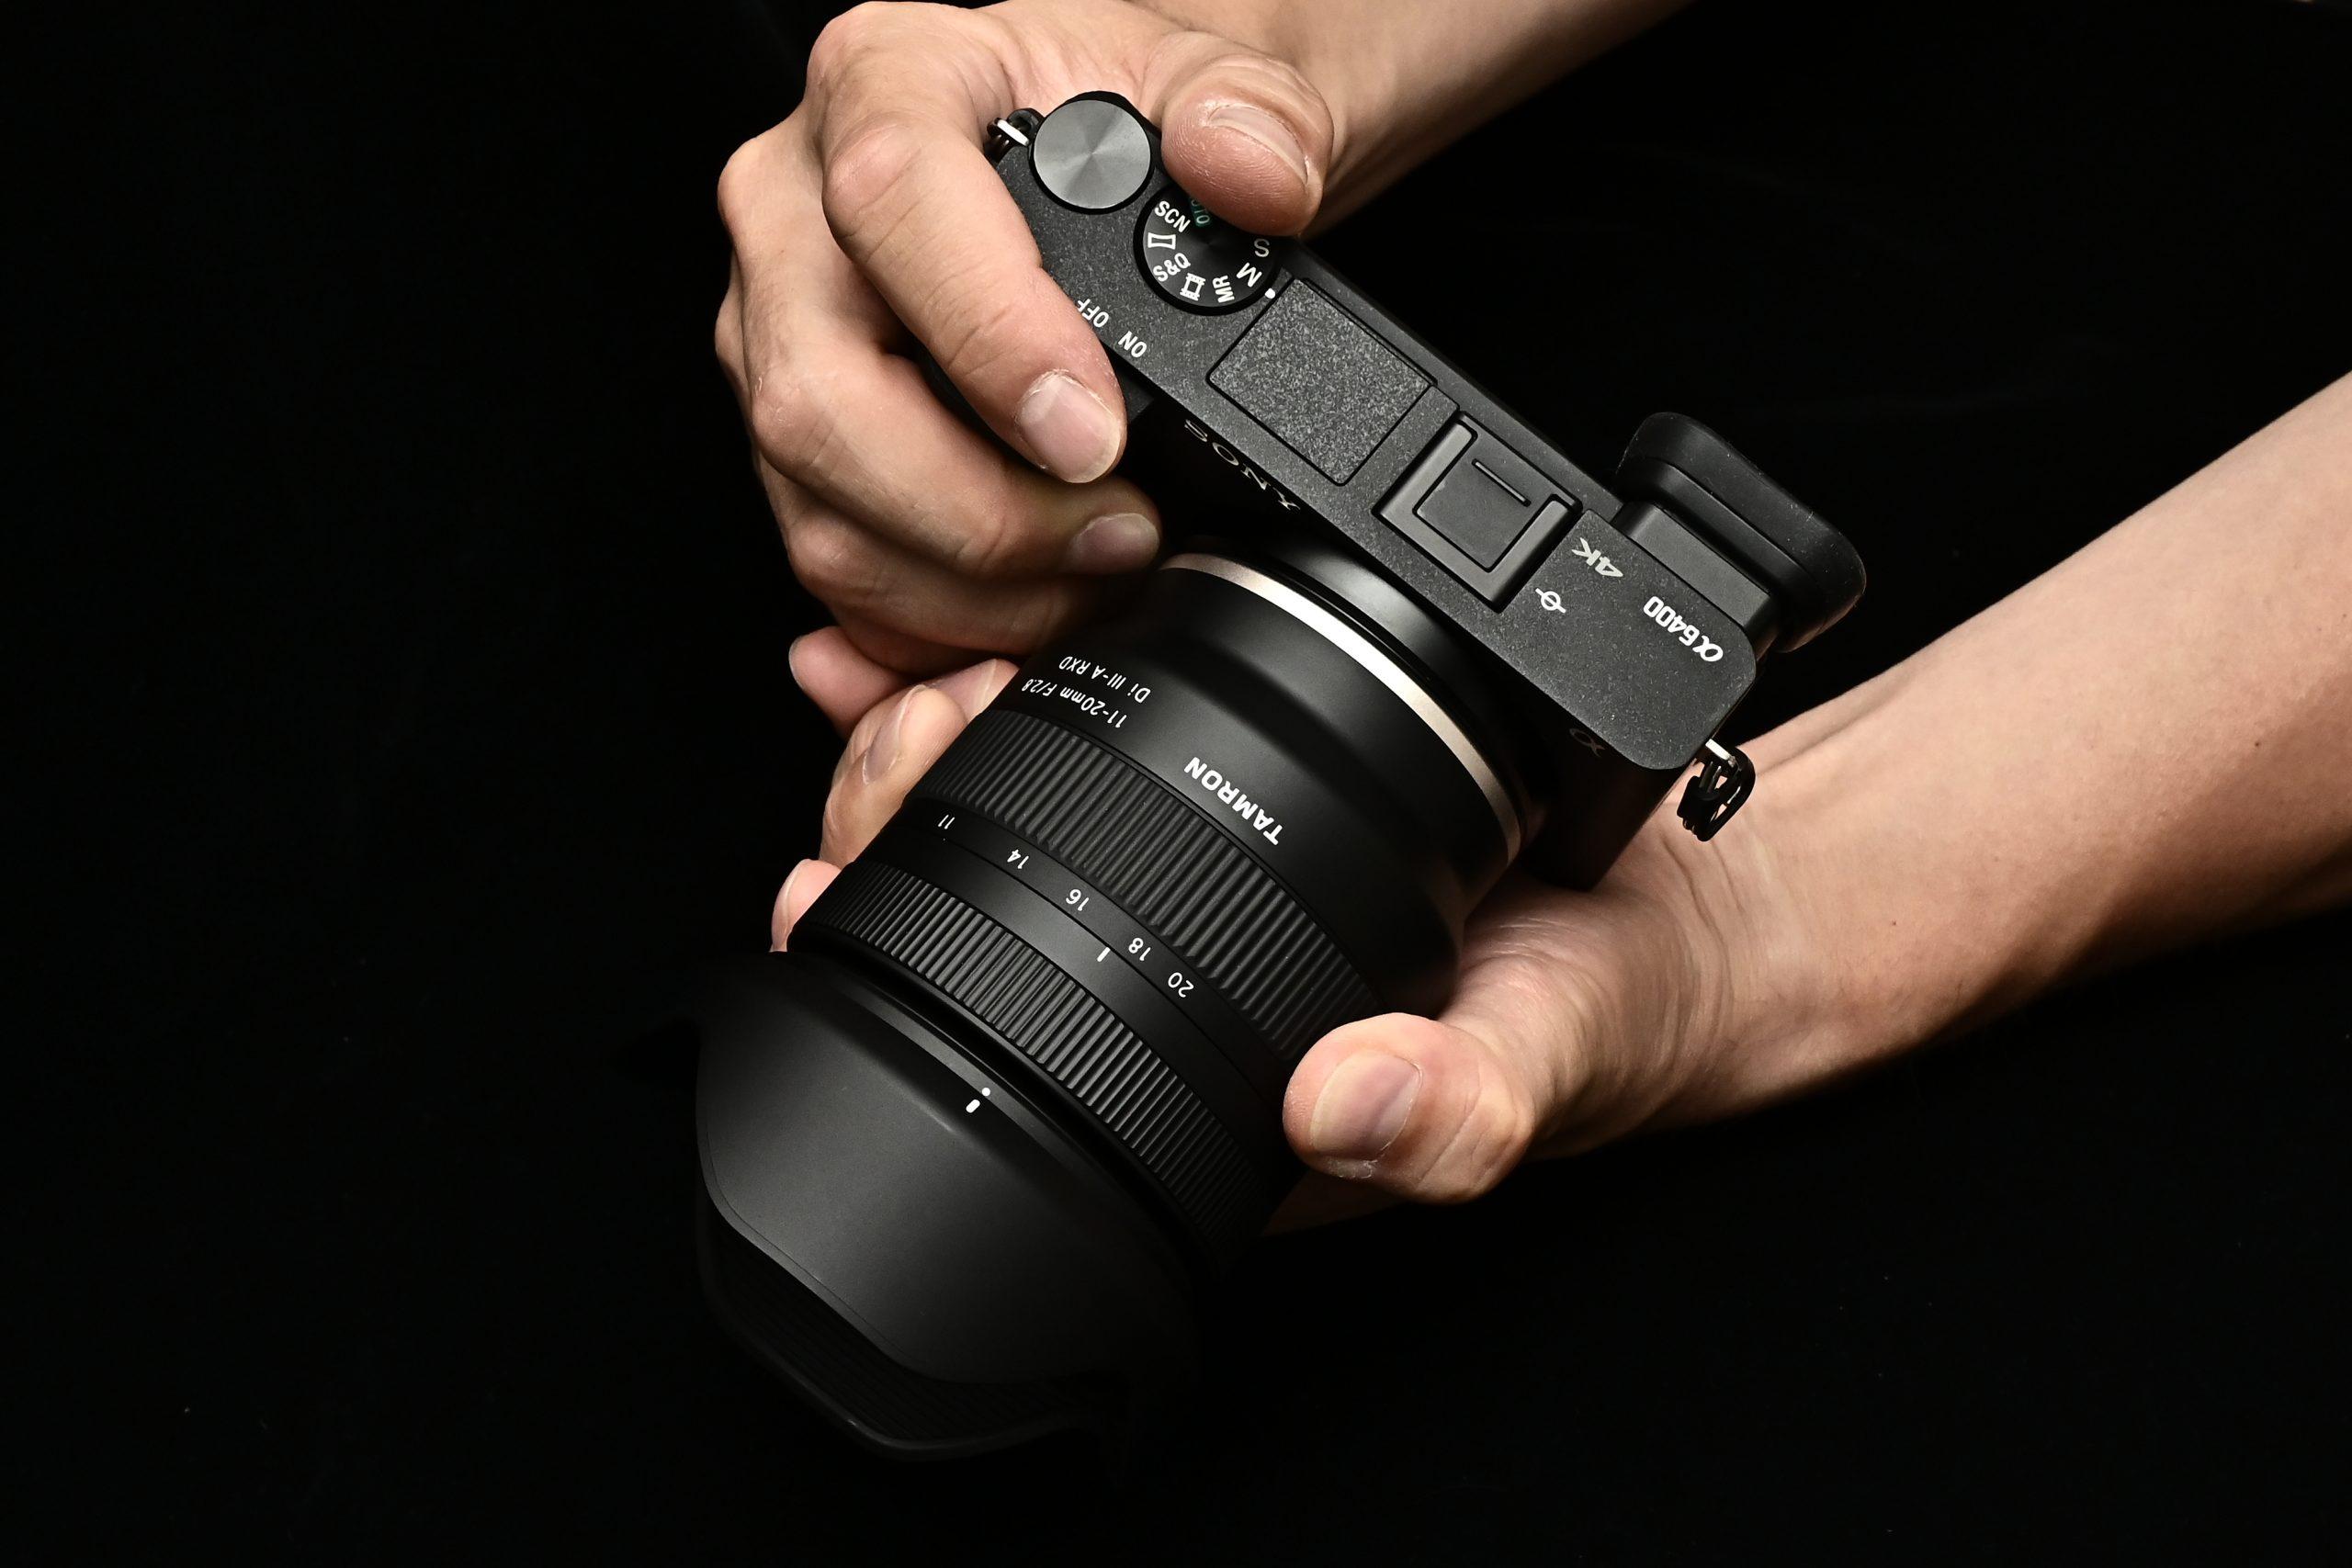 【TAMRON】11-20mm F2.8 DiIII-A RXD B060S【外観写真】